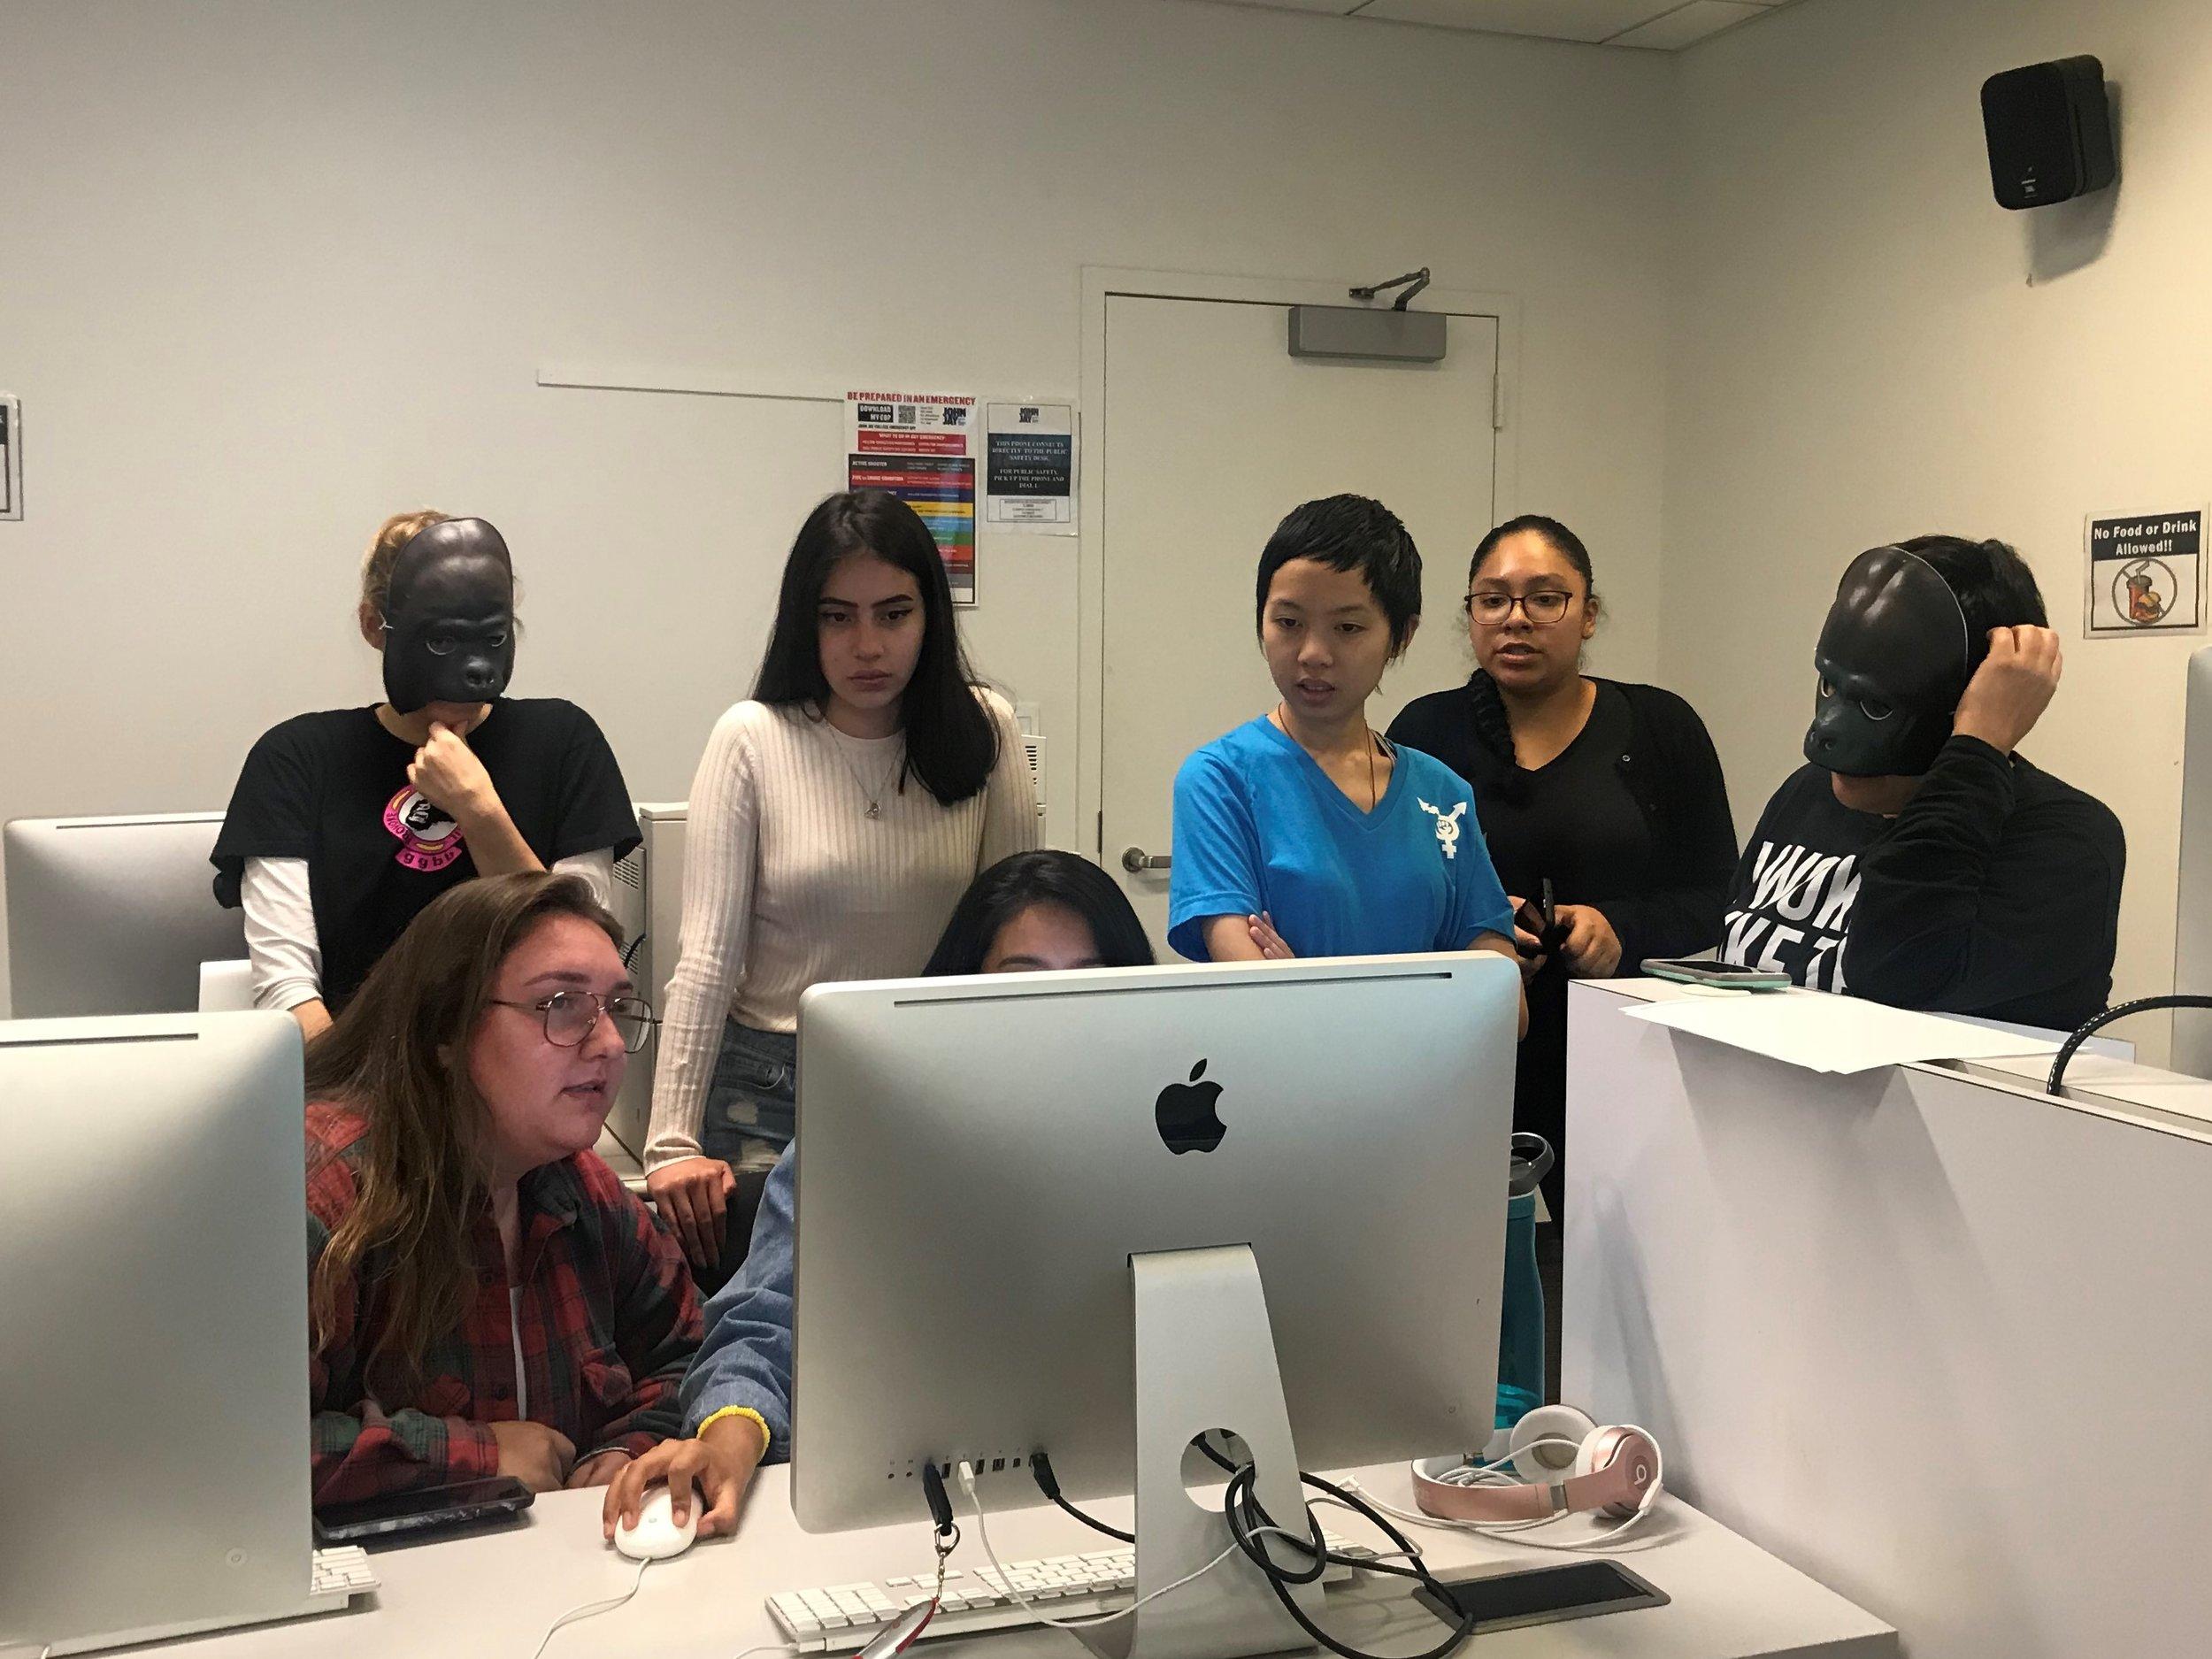 Guerrilla Girls Broadband workshop with students of John Jay College_The Un-Heroic Act_Sept. 28 2018. Photo Monika Fabijanska